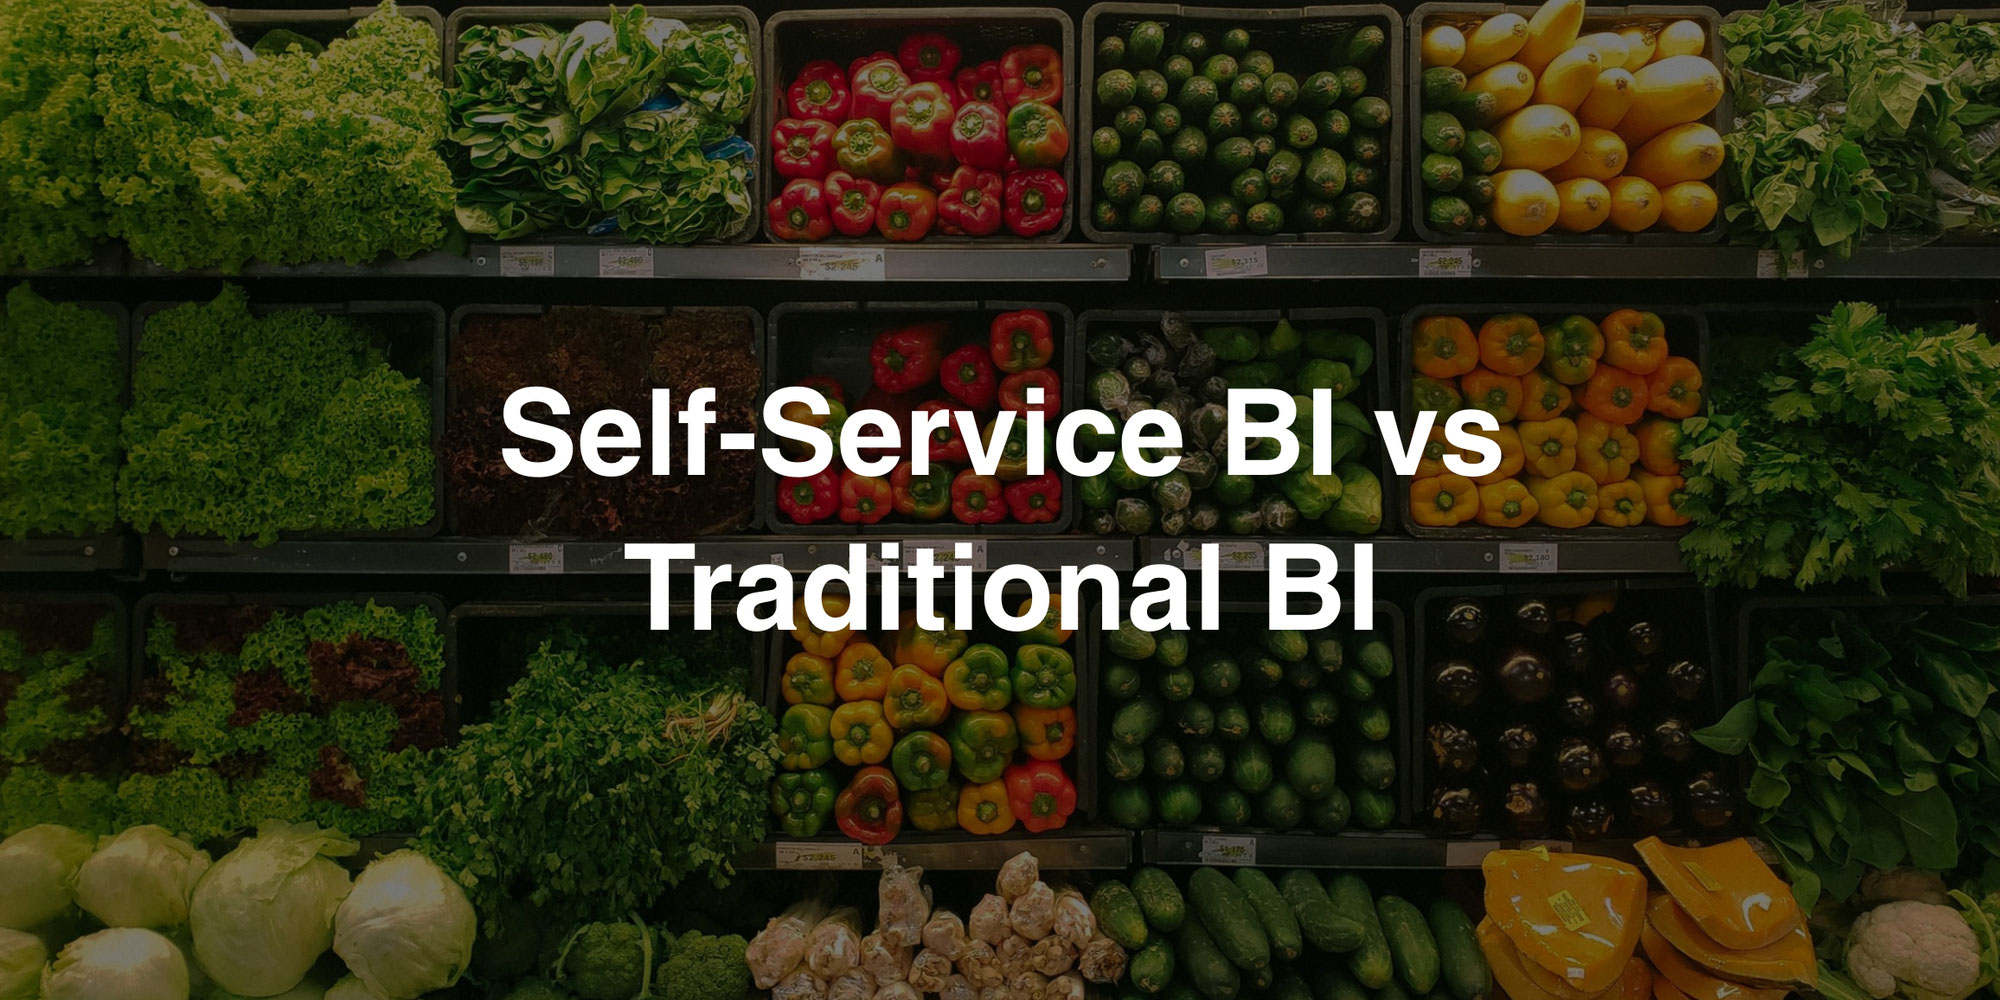 Self-Service BI vs. Traditional BI